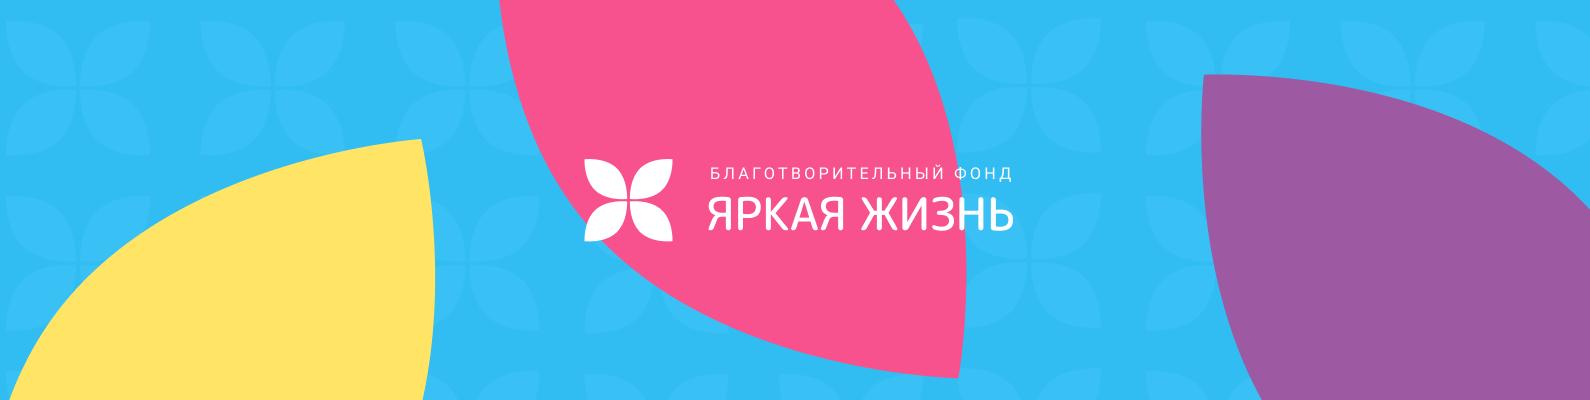 oblozhka_VK2